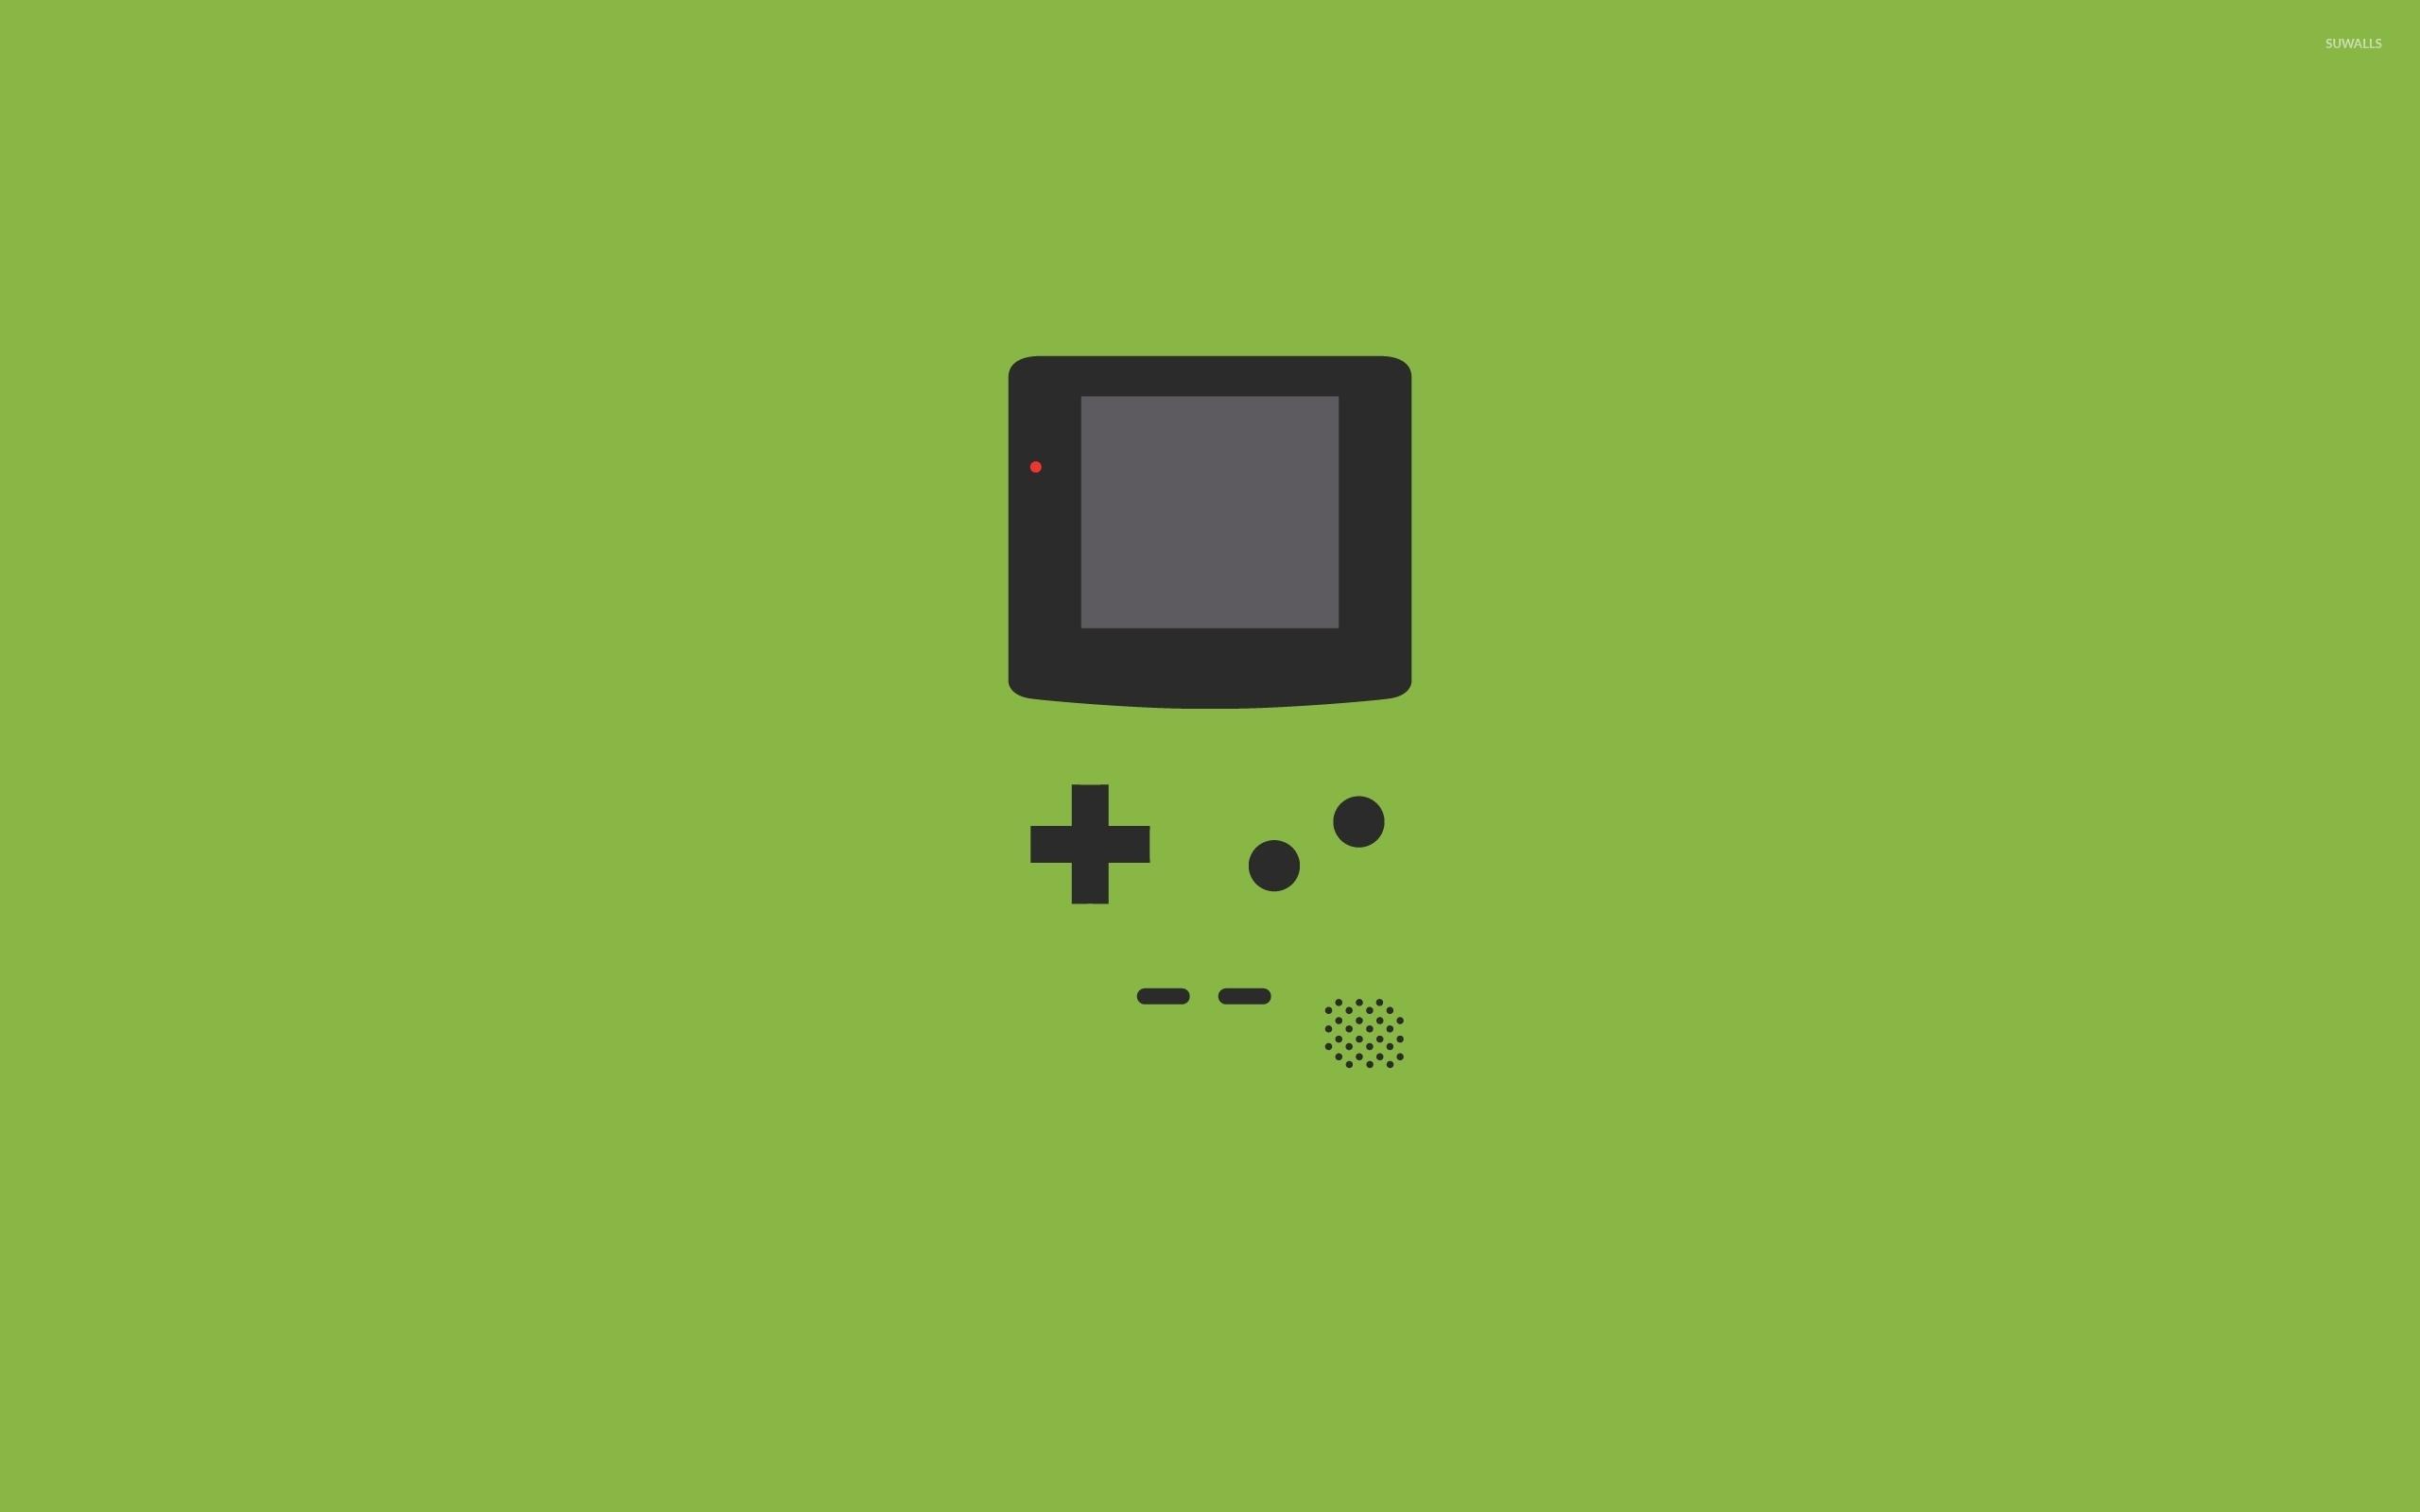 Game Boy wallpaper   Minimalistic wallpapers   43583 1280x800